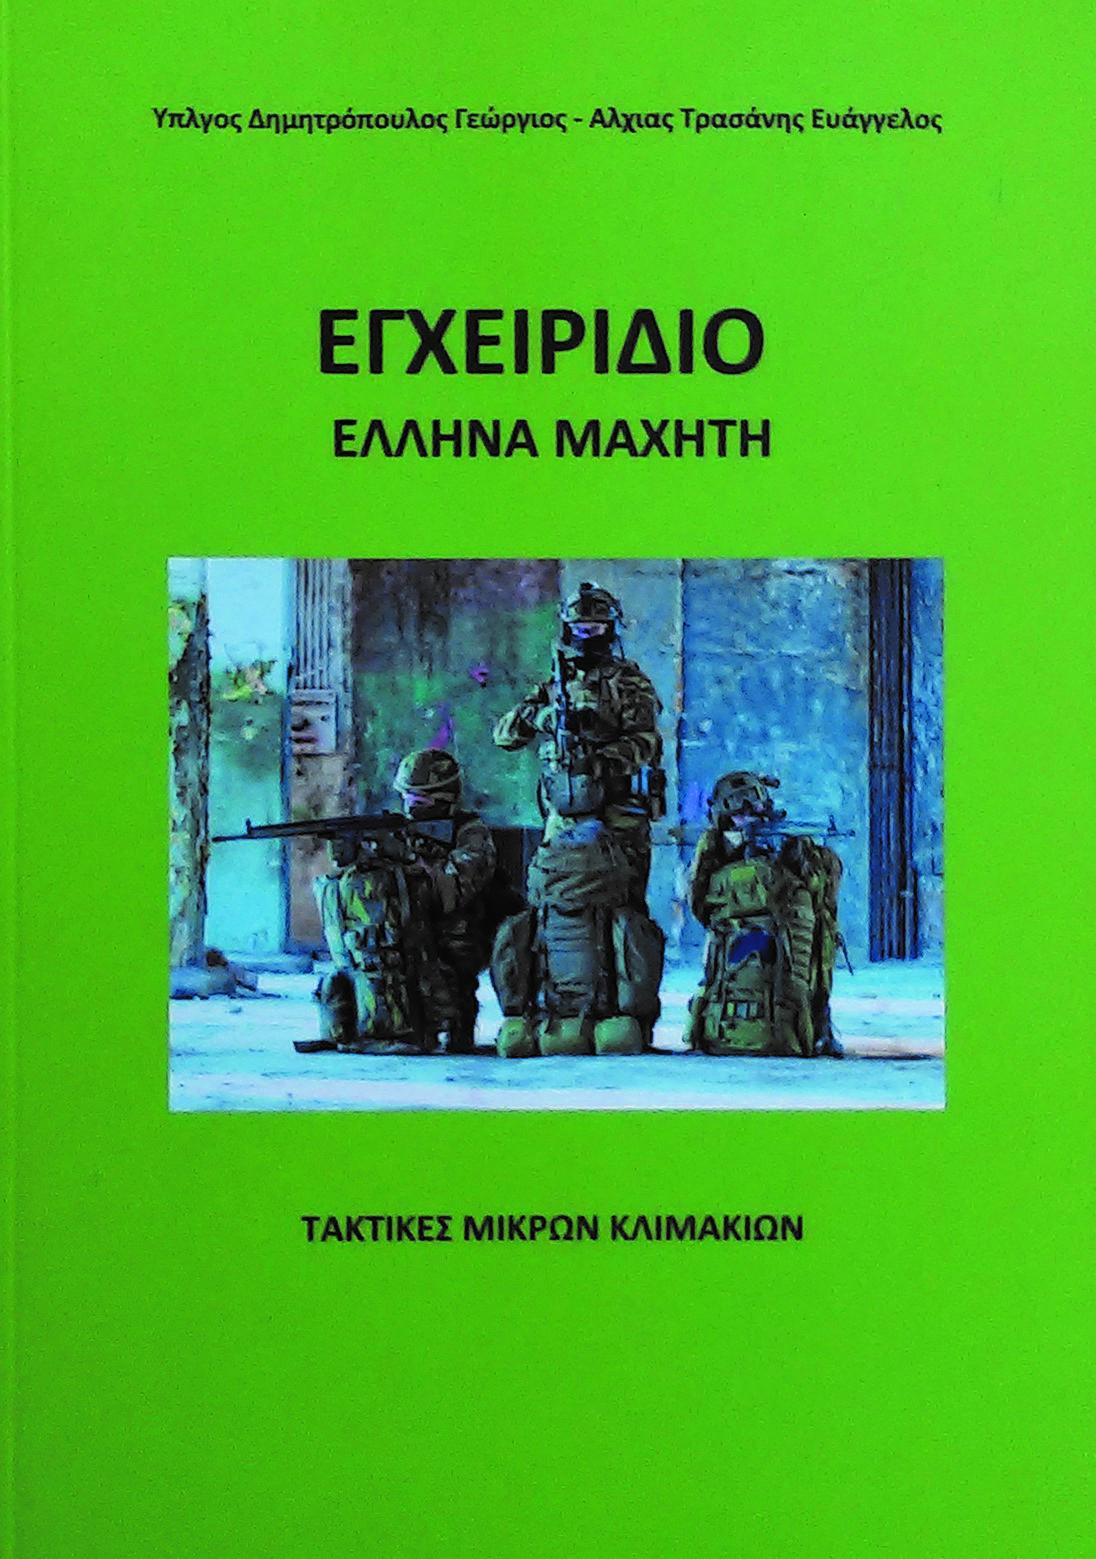 Photo of Εγχειρίδιο Έλληνα Μαχητή